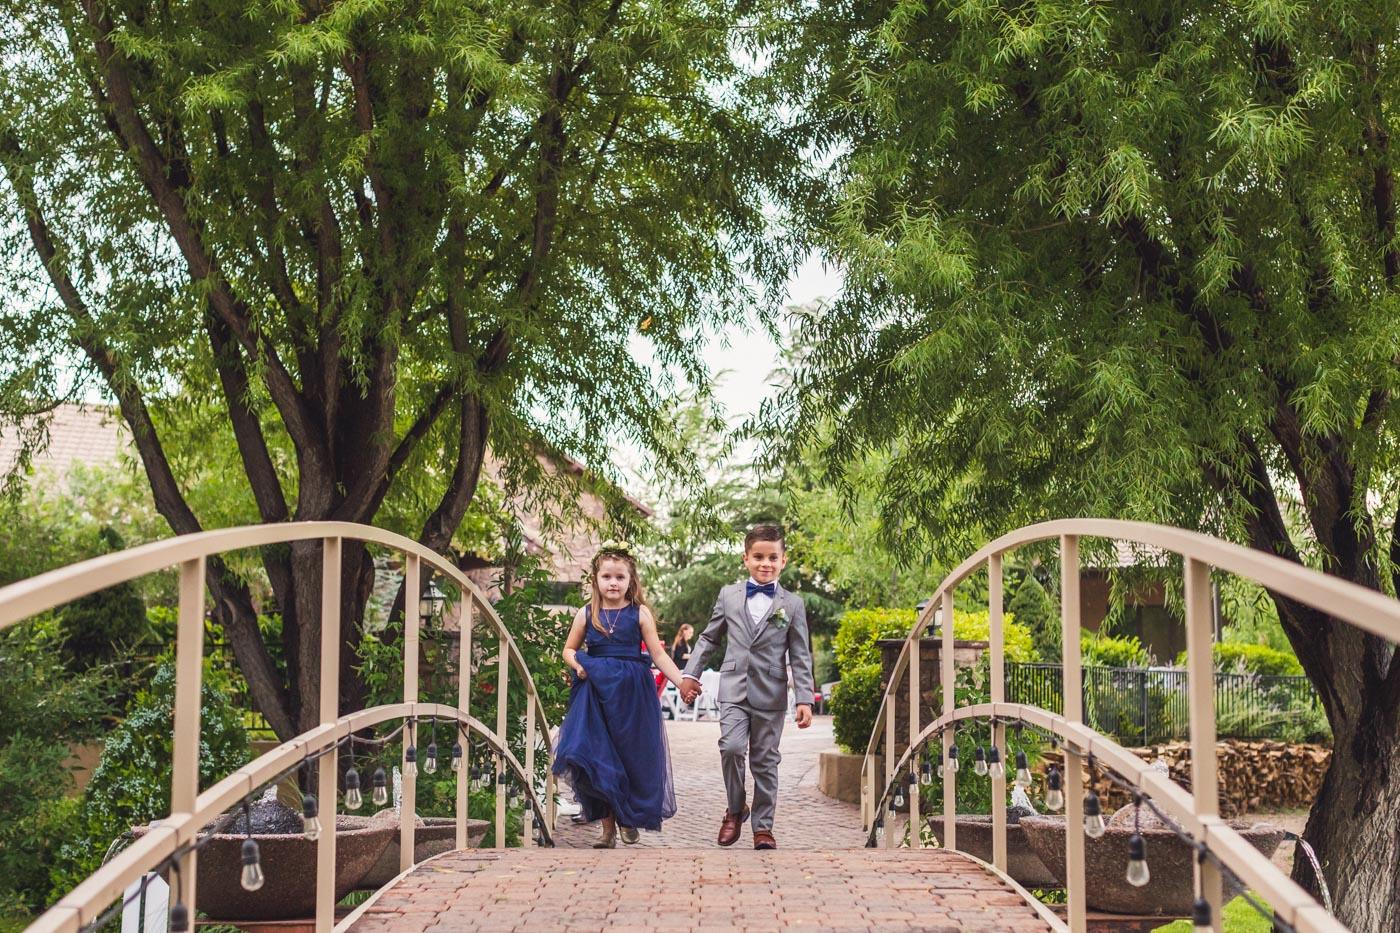 children-of-couple-walk-to-wedding-ceremony